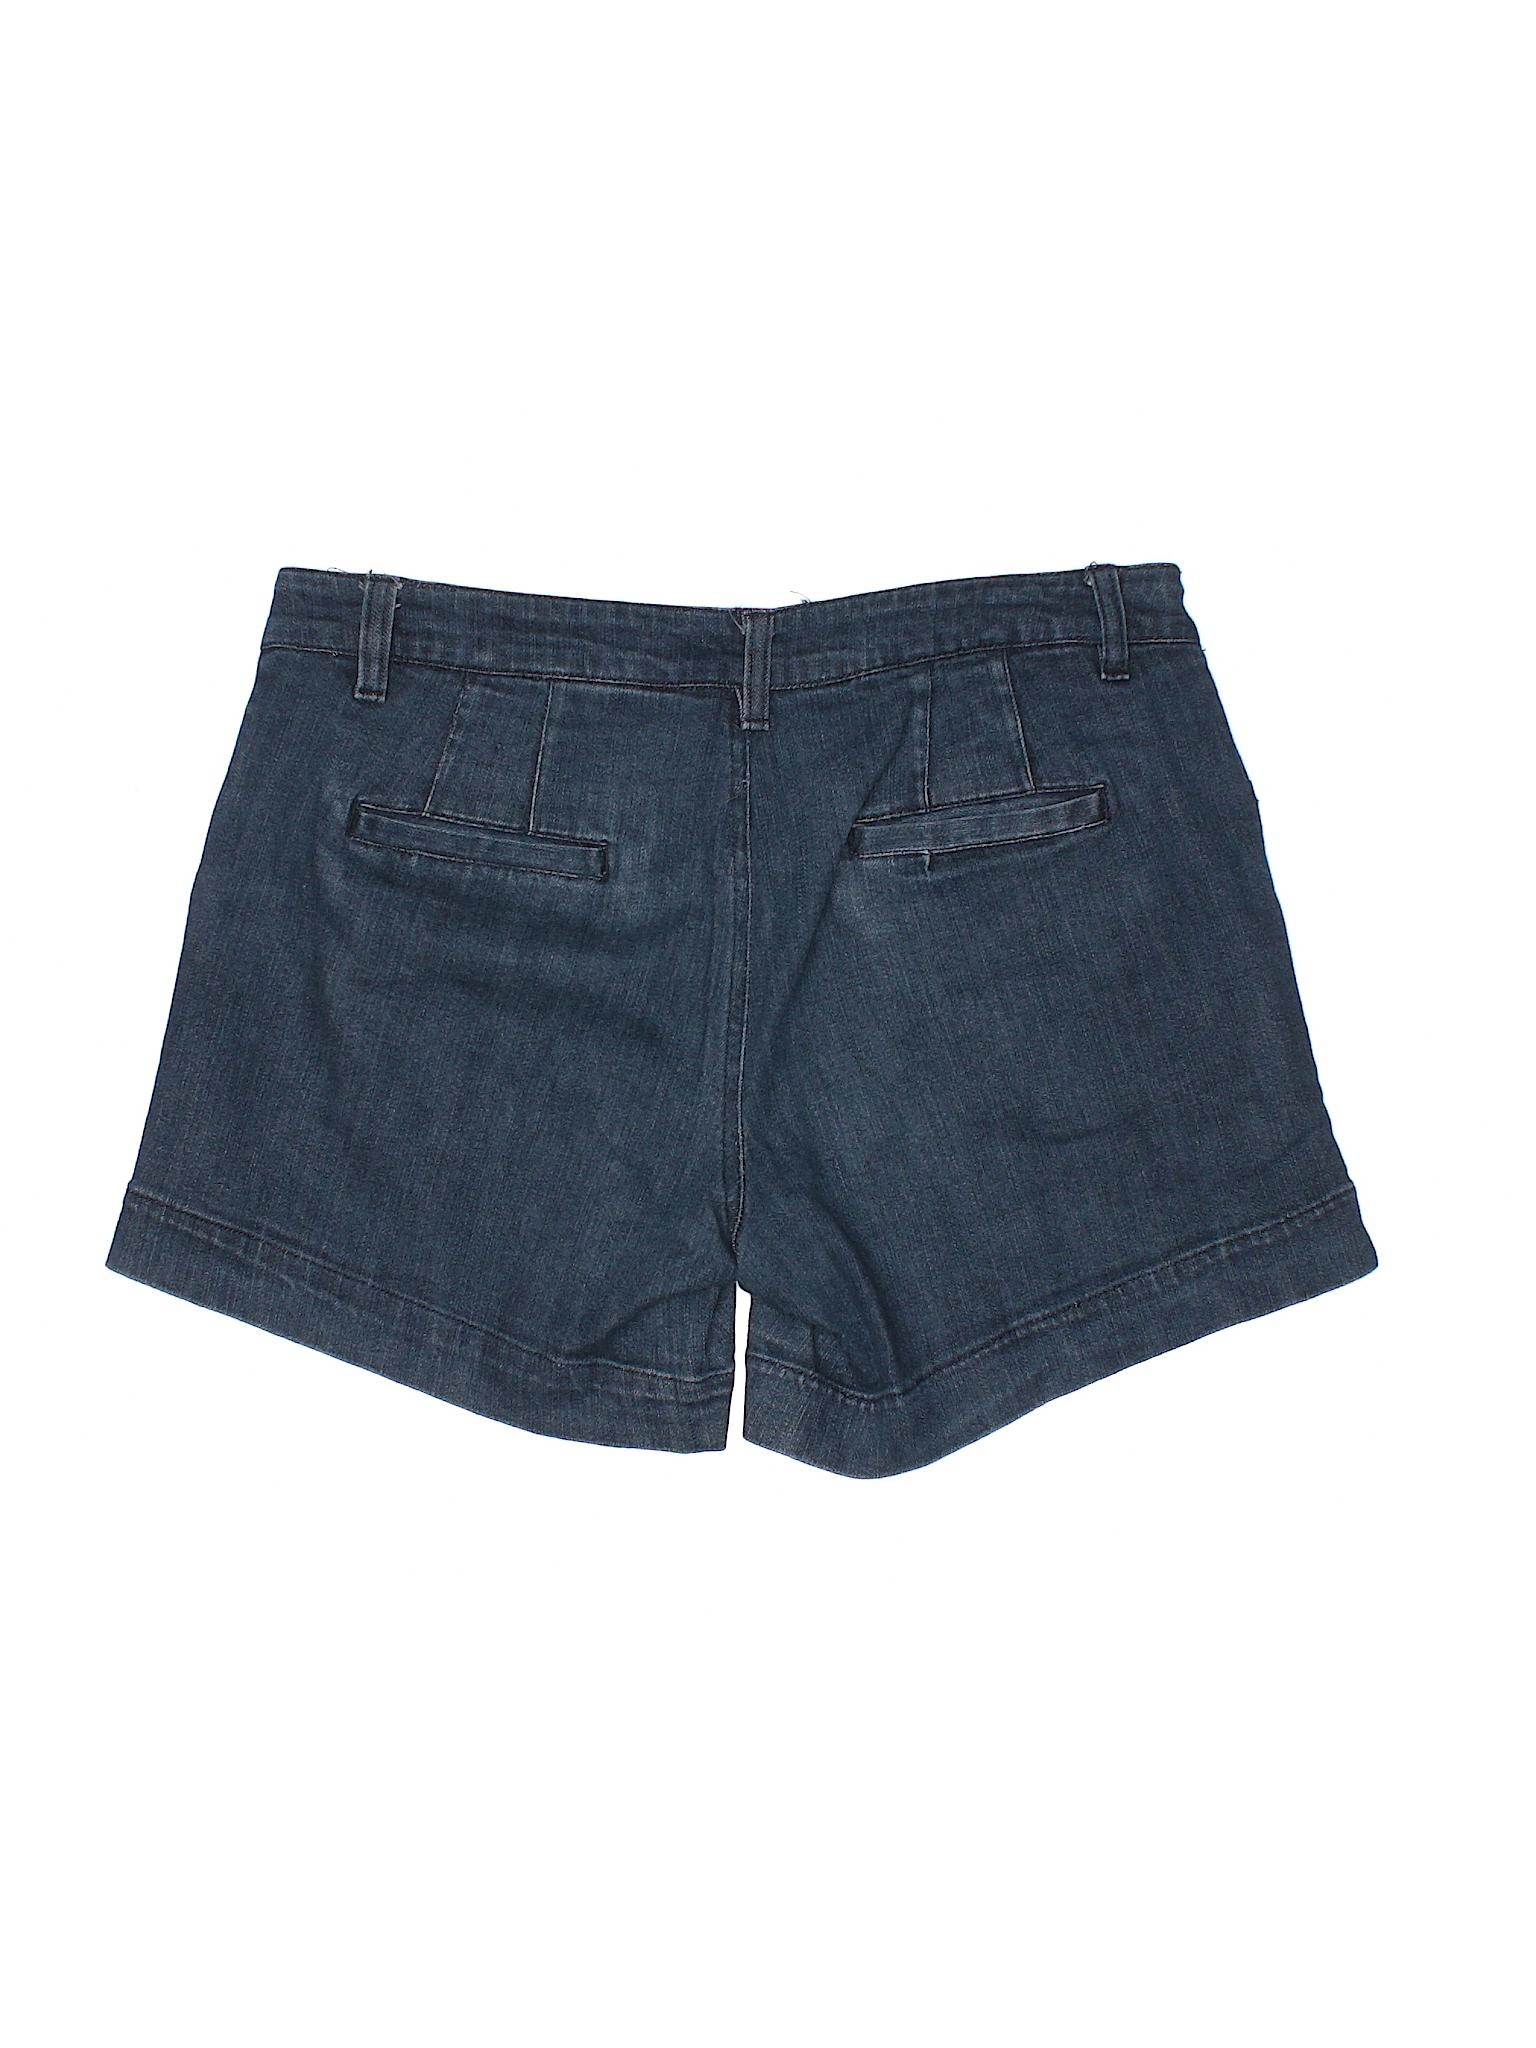 Shorts The Limited winter Leisure Denim w7qz7g